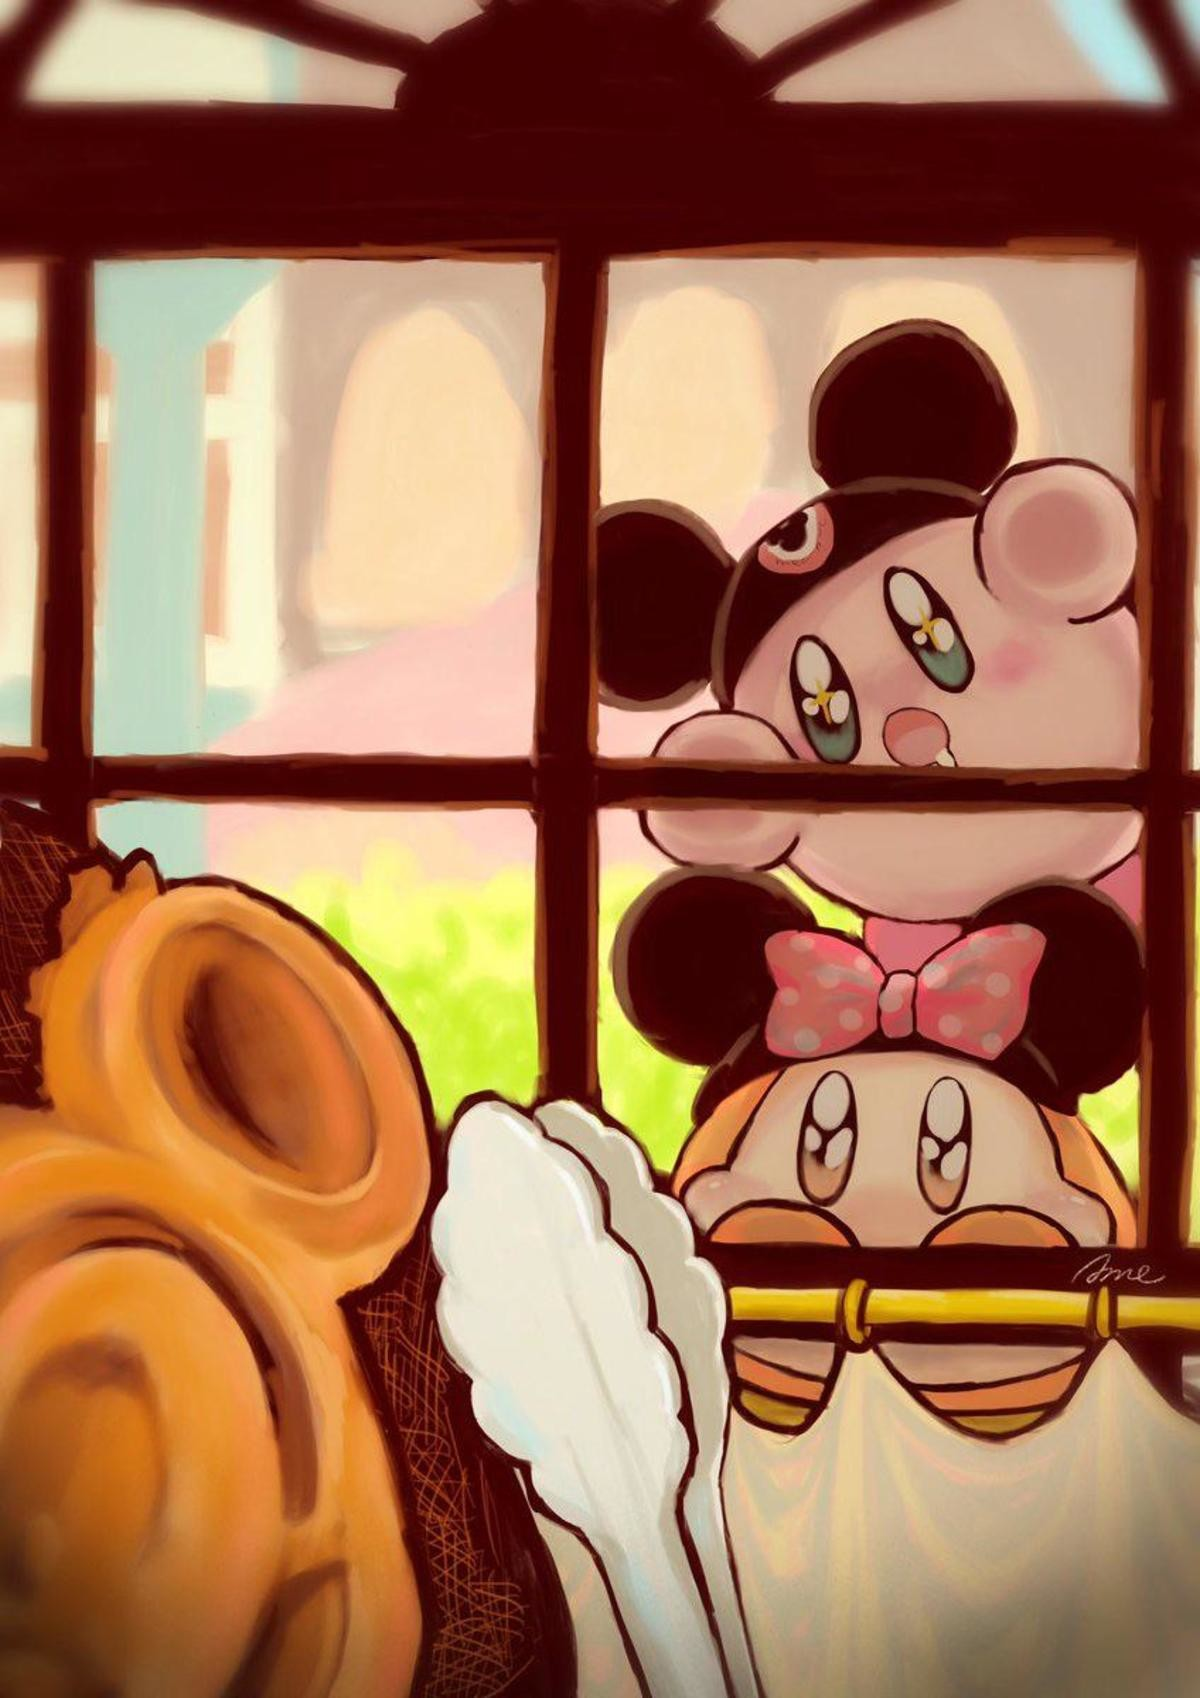 Disneyland!. .. I want a whole series of comics about kirby, Bandana dee, Deedeedee and metaknight going to disney